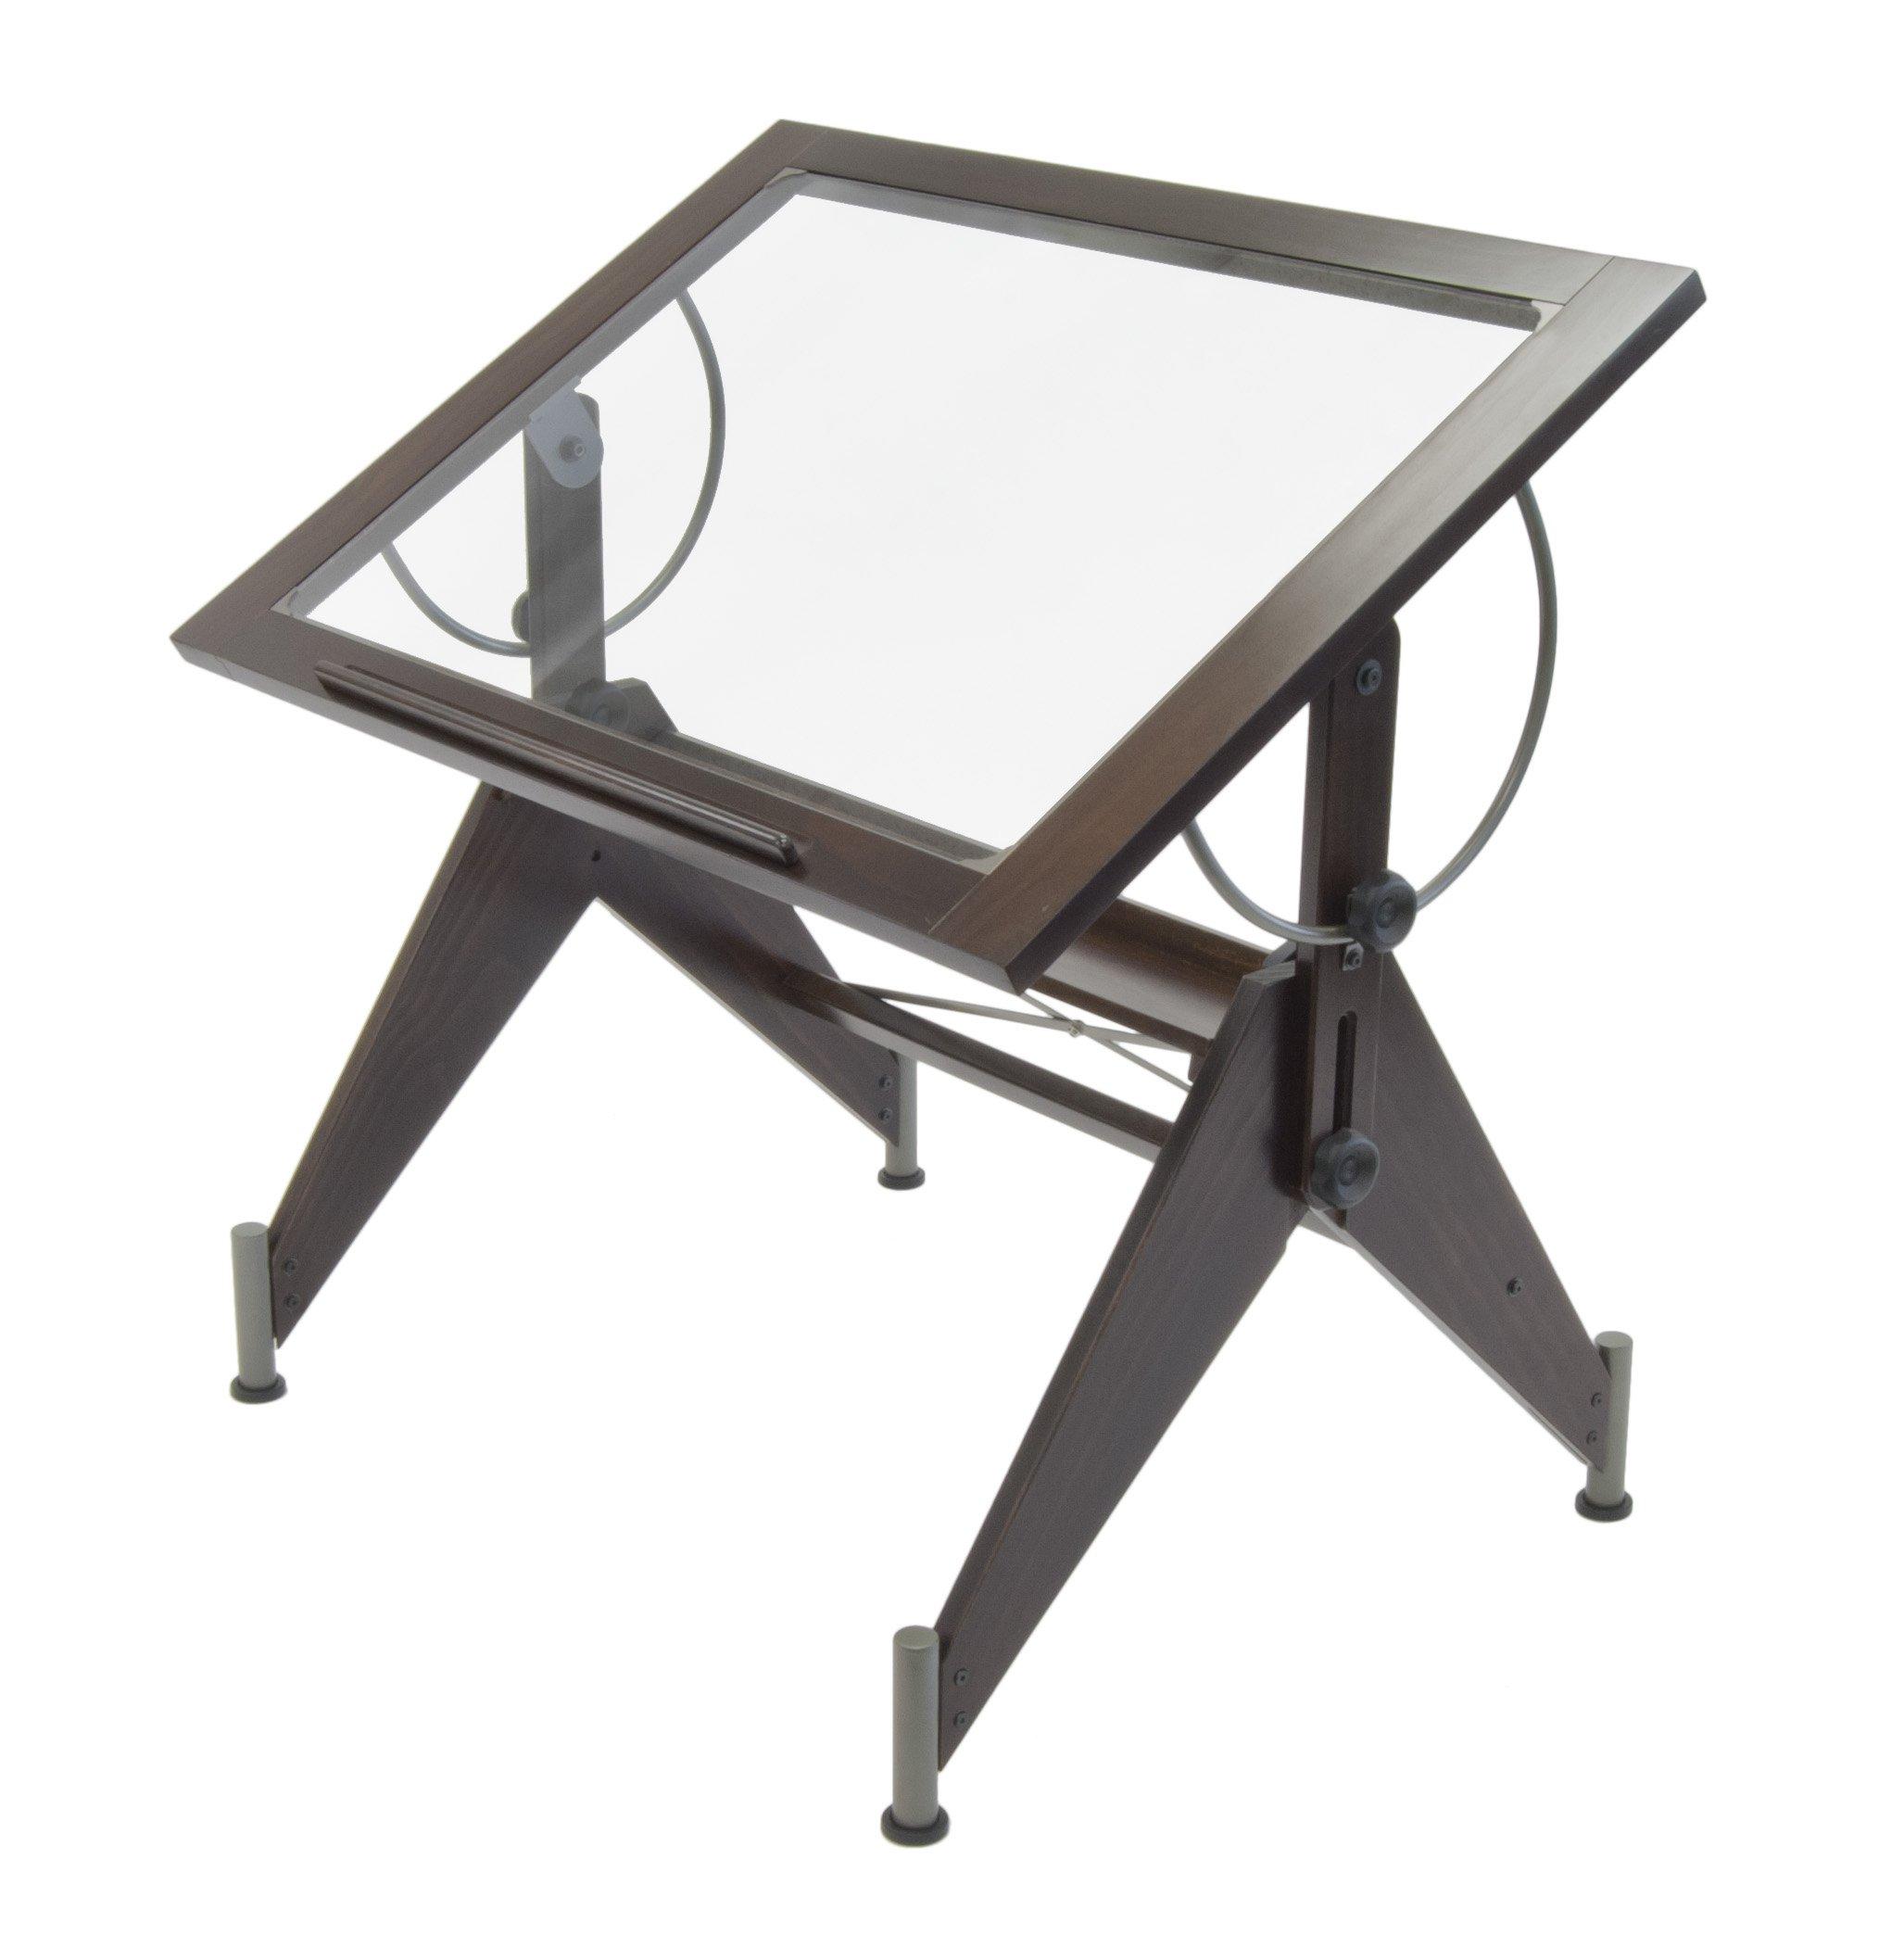 Studio Designs 13311 Aries Glass Top Drafting Table, Dark Walnut with Champagne Metal by STUDIO DESIGNS INSPIRING CREATIVITY WWW.STUDIODESIGNS.COM